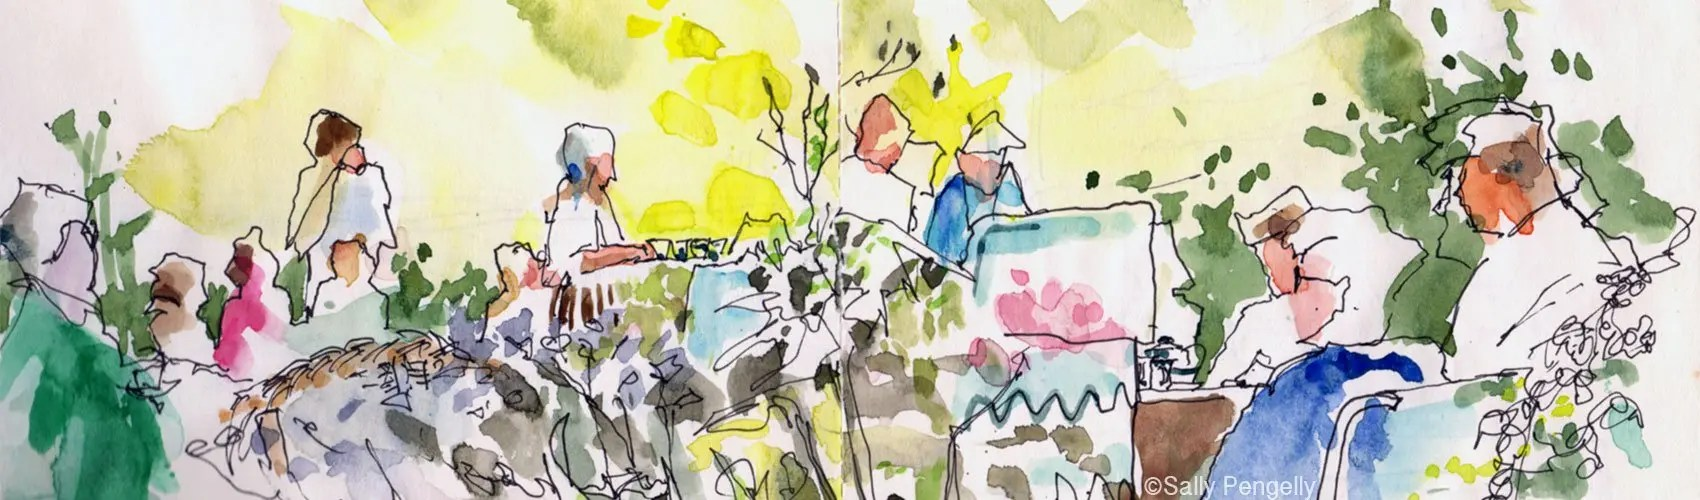 Sally Pengelley, Summer Tea Party, Rachels Garden